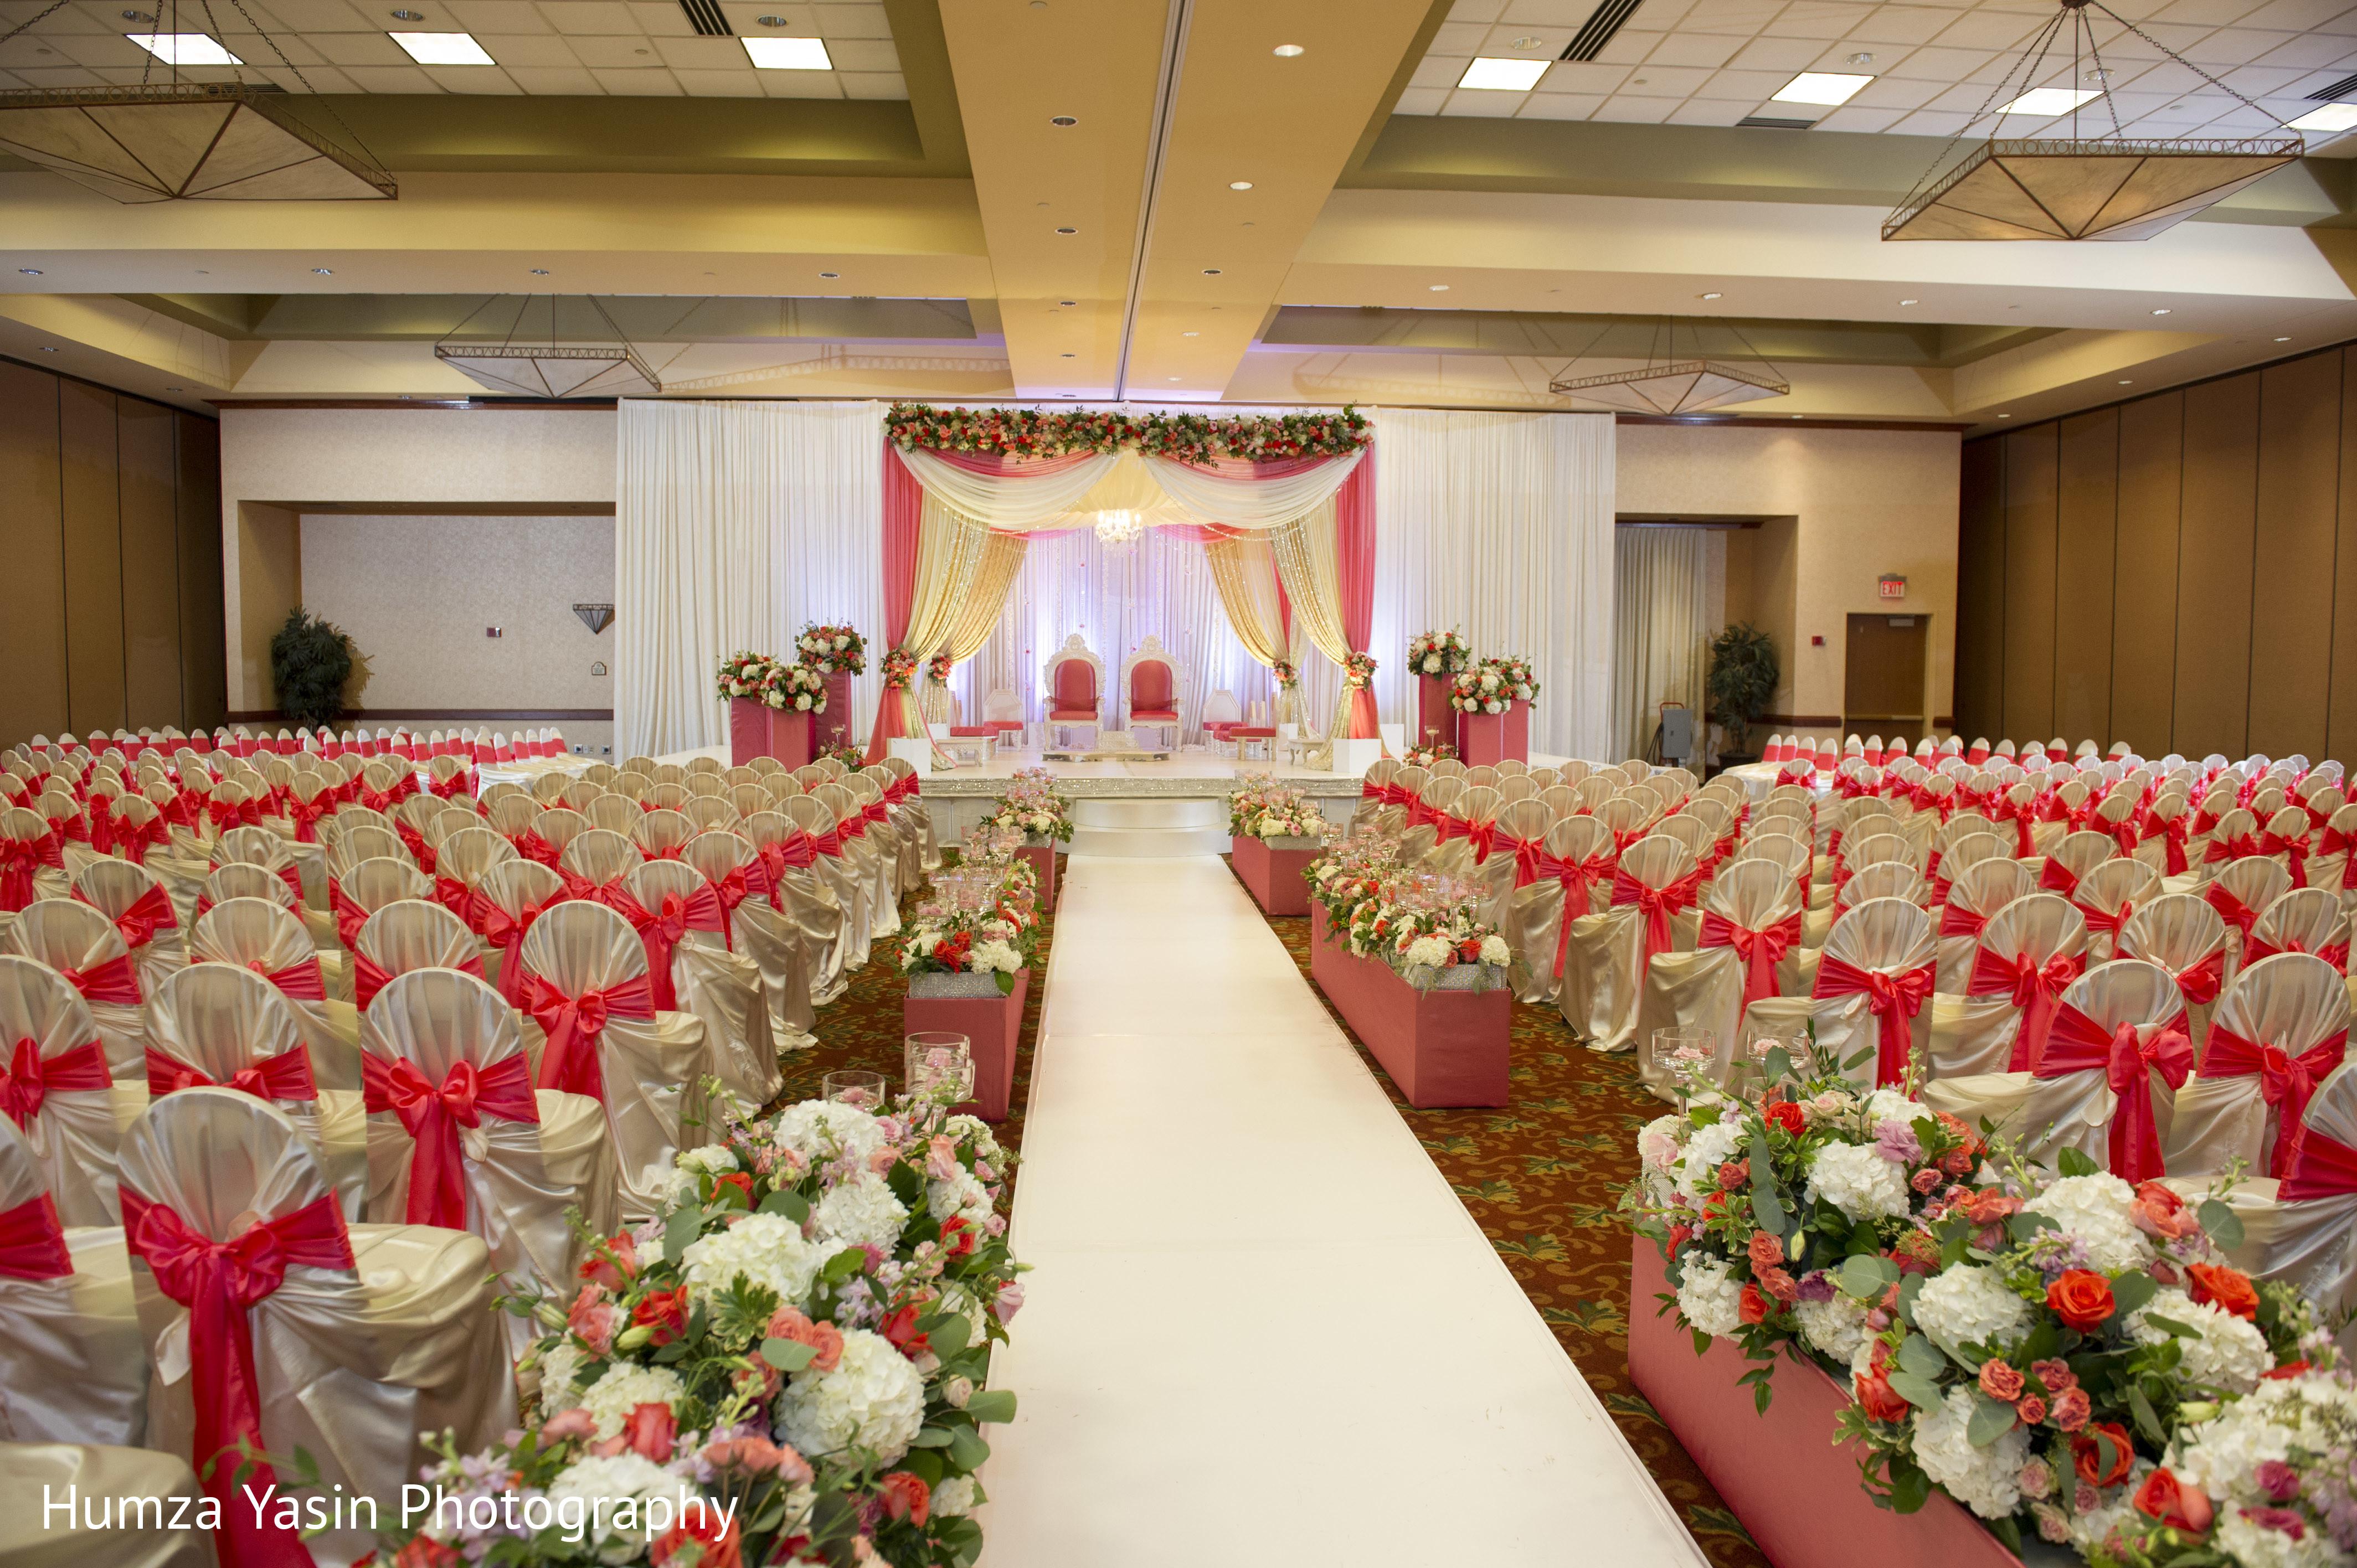 Grapevine Tx Gujarati Wedding By Humza Yasin Photography Post 6262